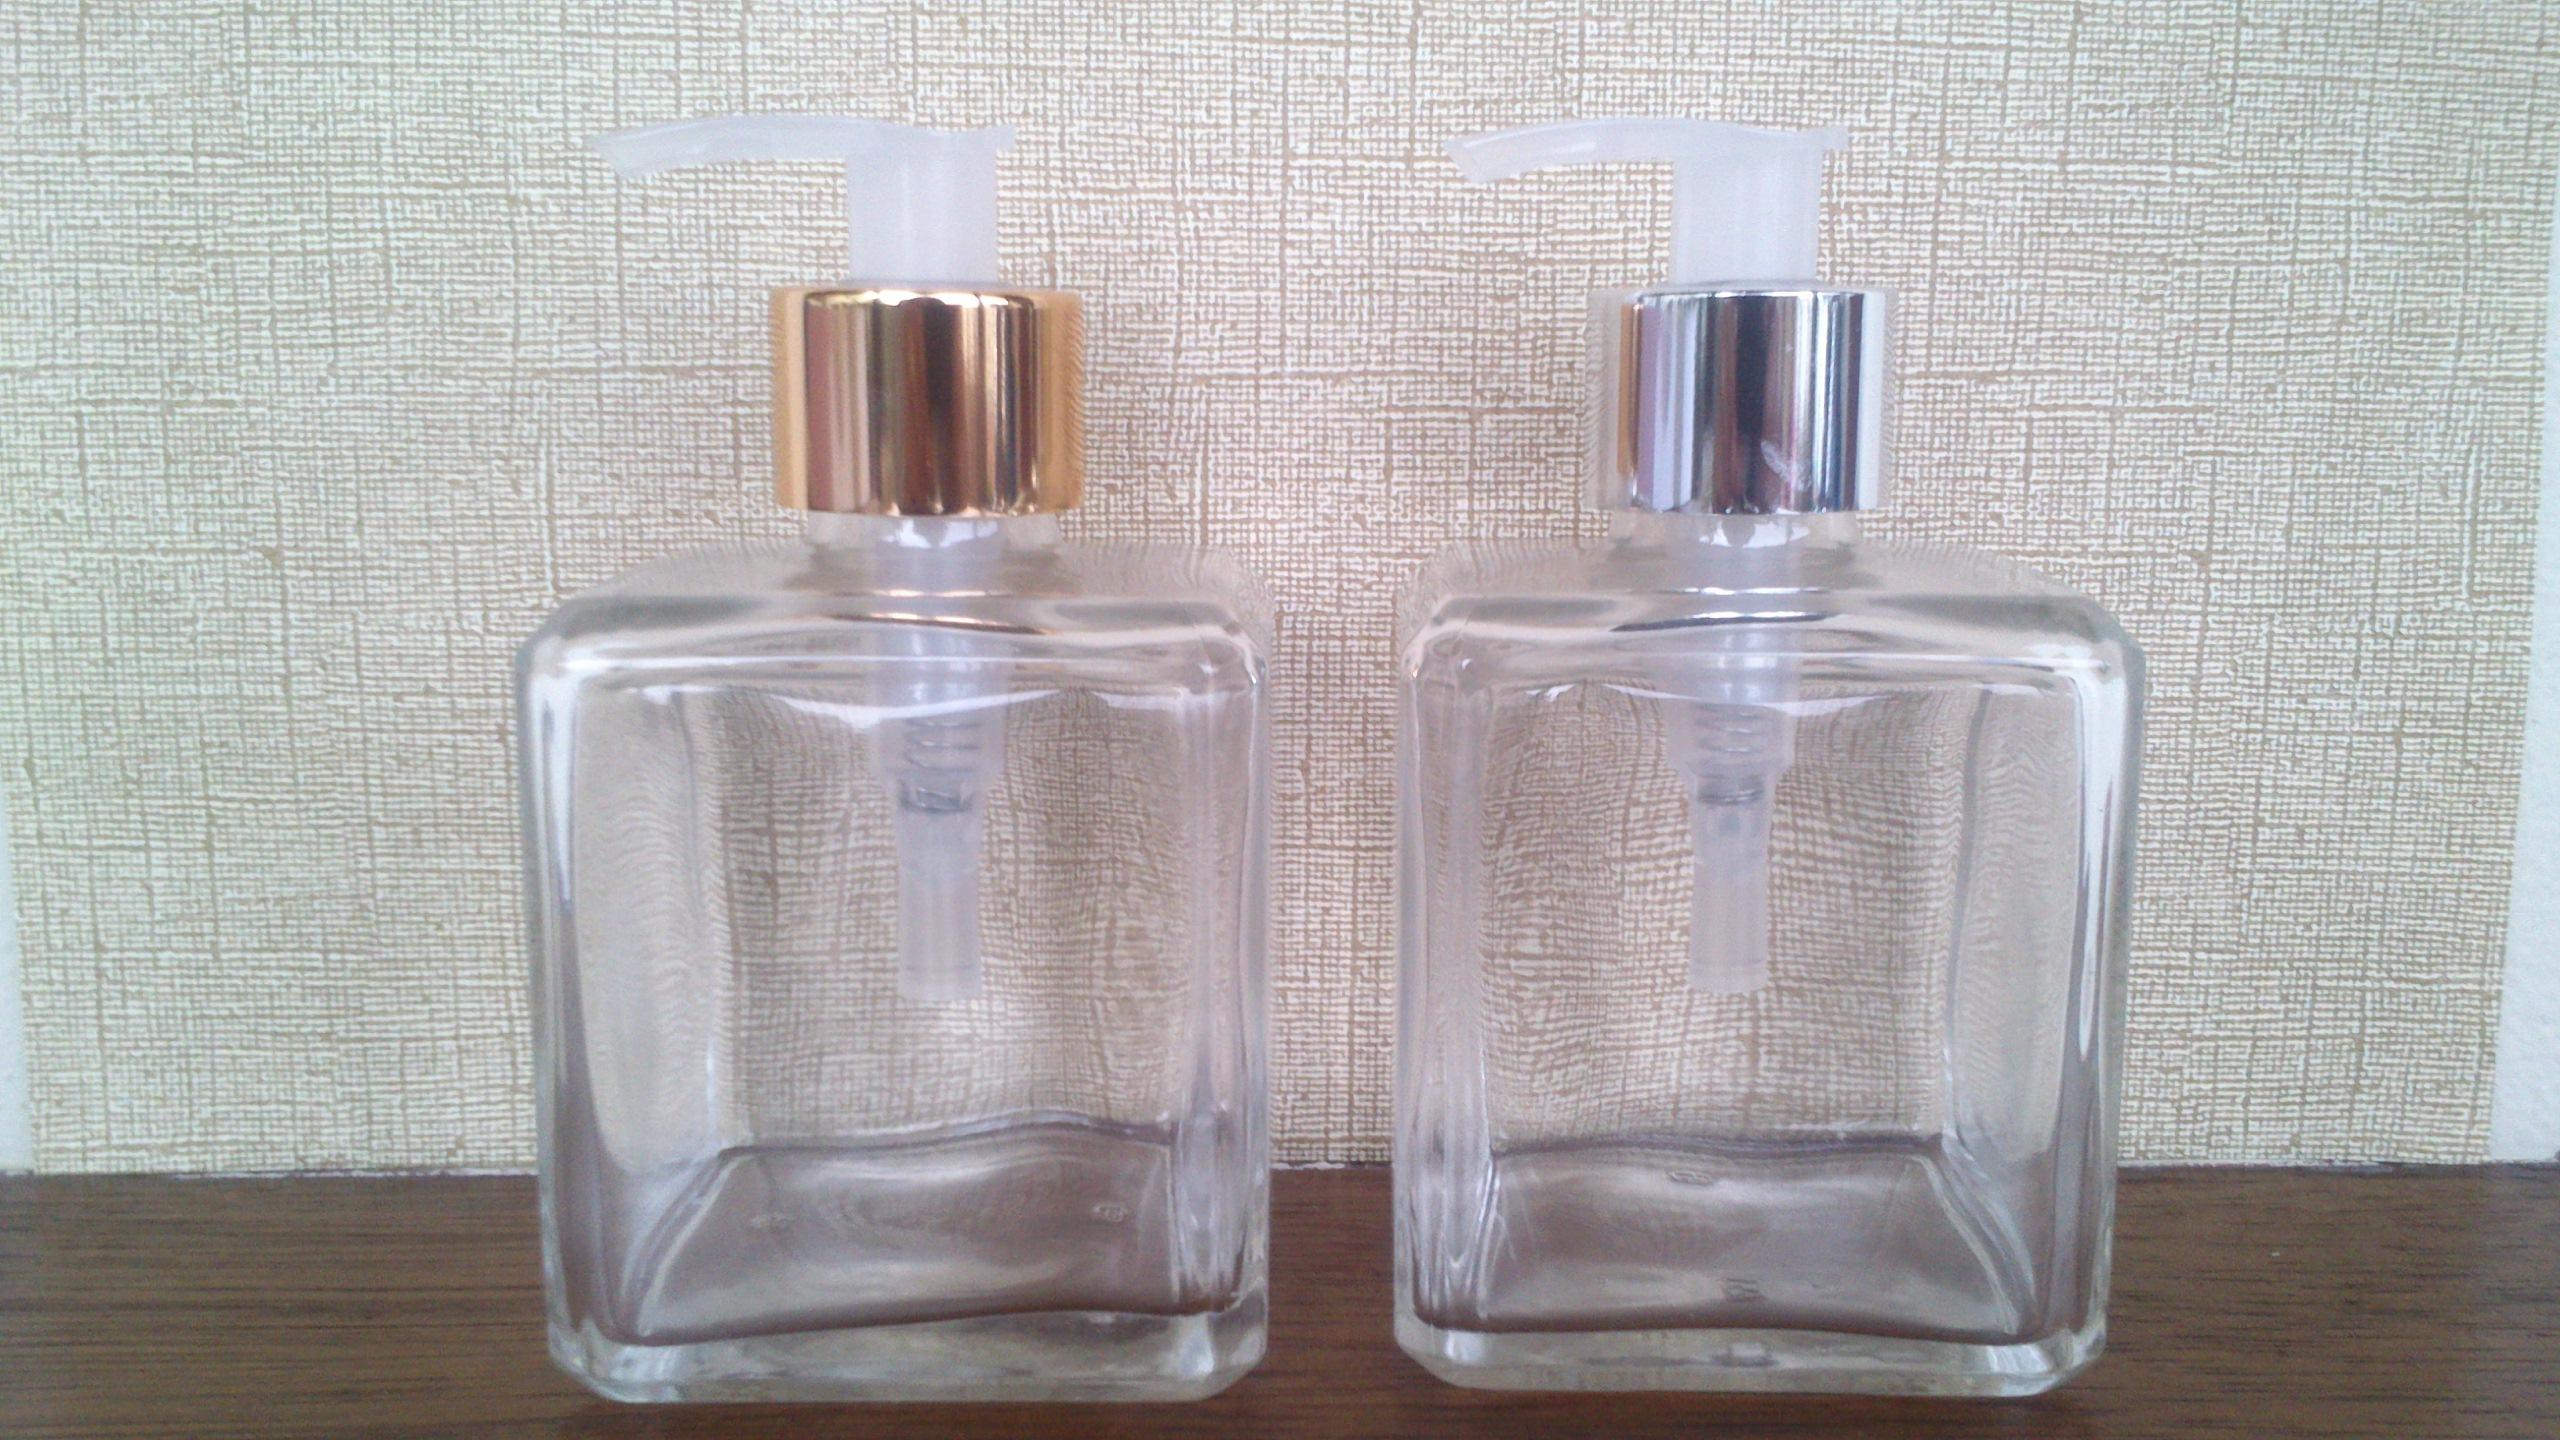 frasco vidro cubo 250 ml saboneteira frasco de vidro.jpg #4B3730 2560 1440